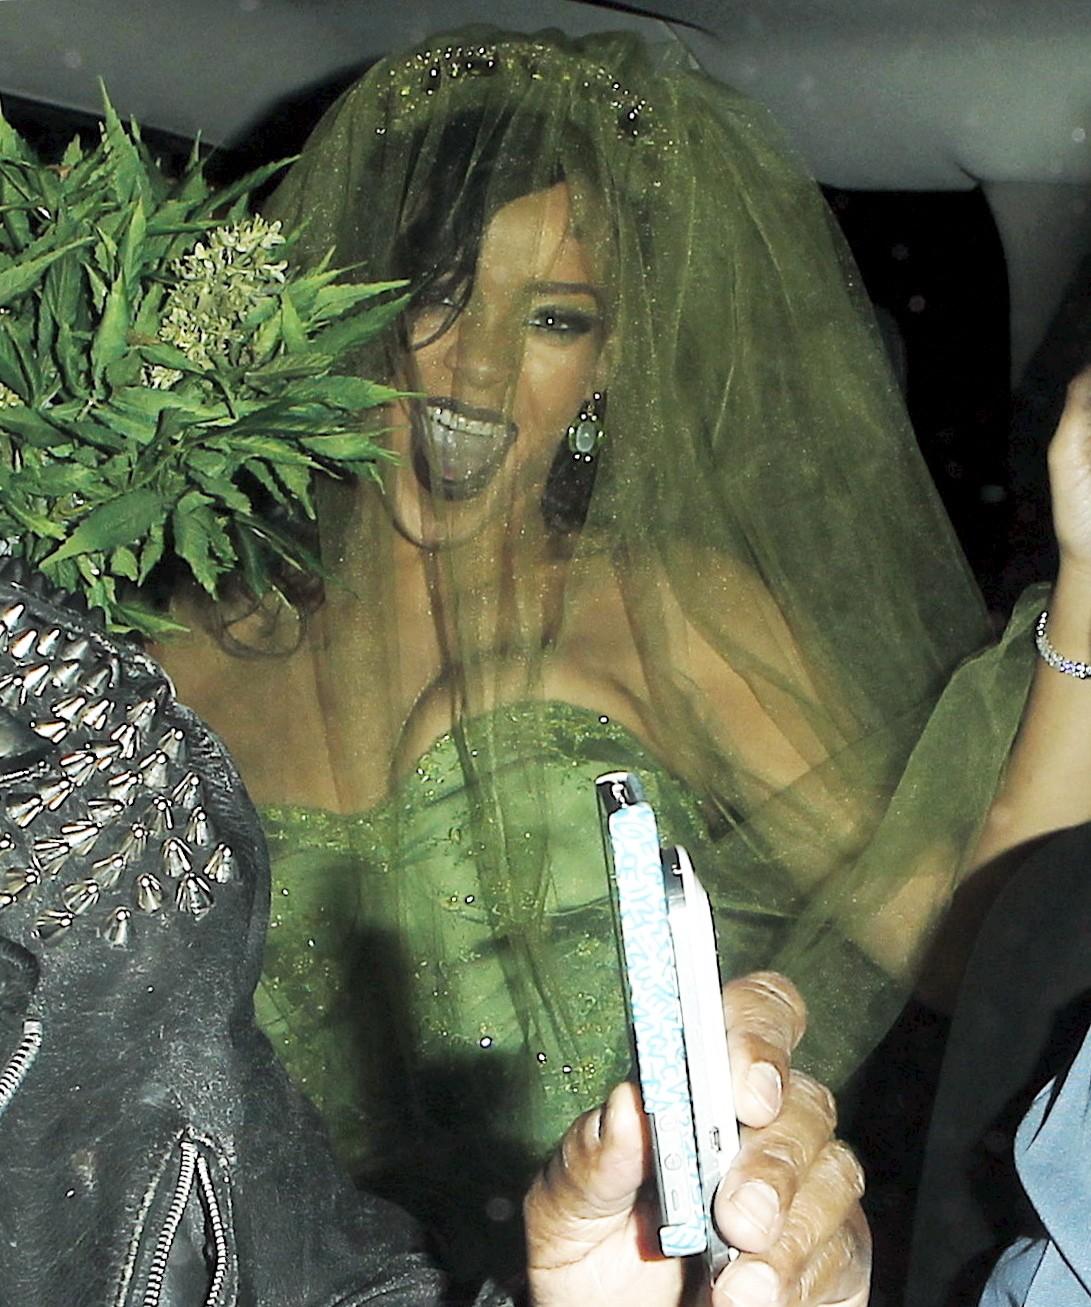 Rihanna%20-%20In%20Halloween%20Costume-02.jpg